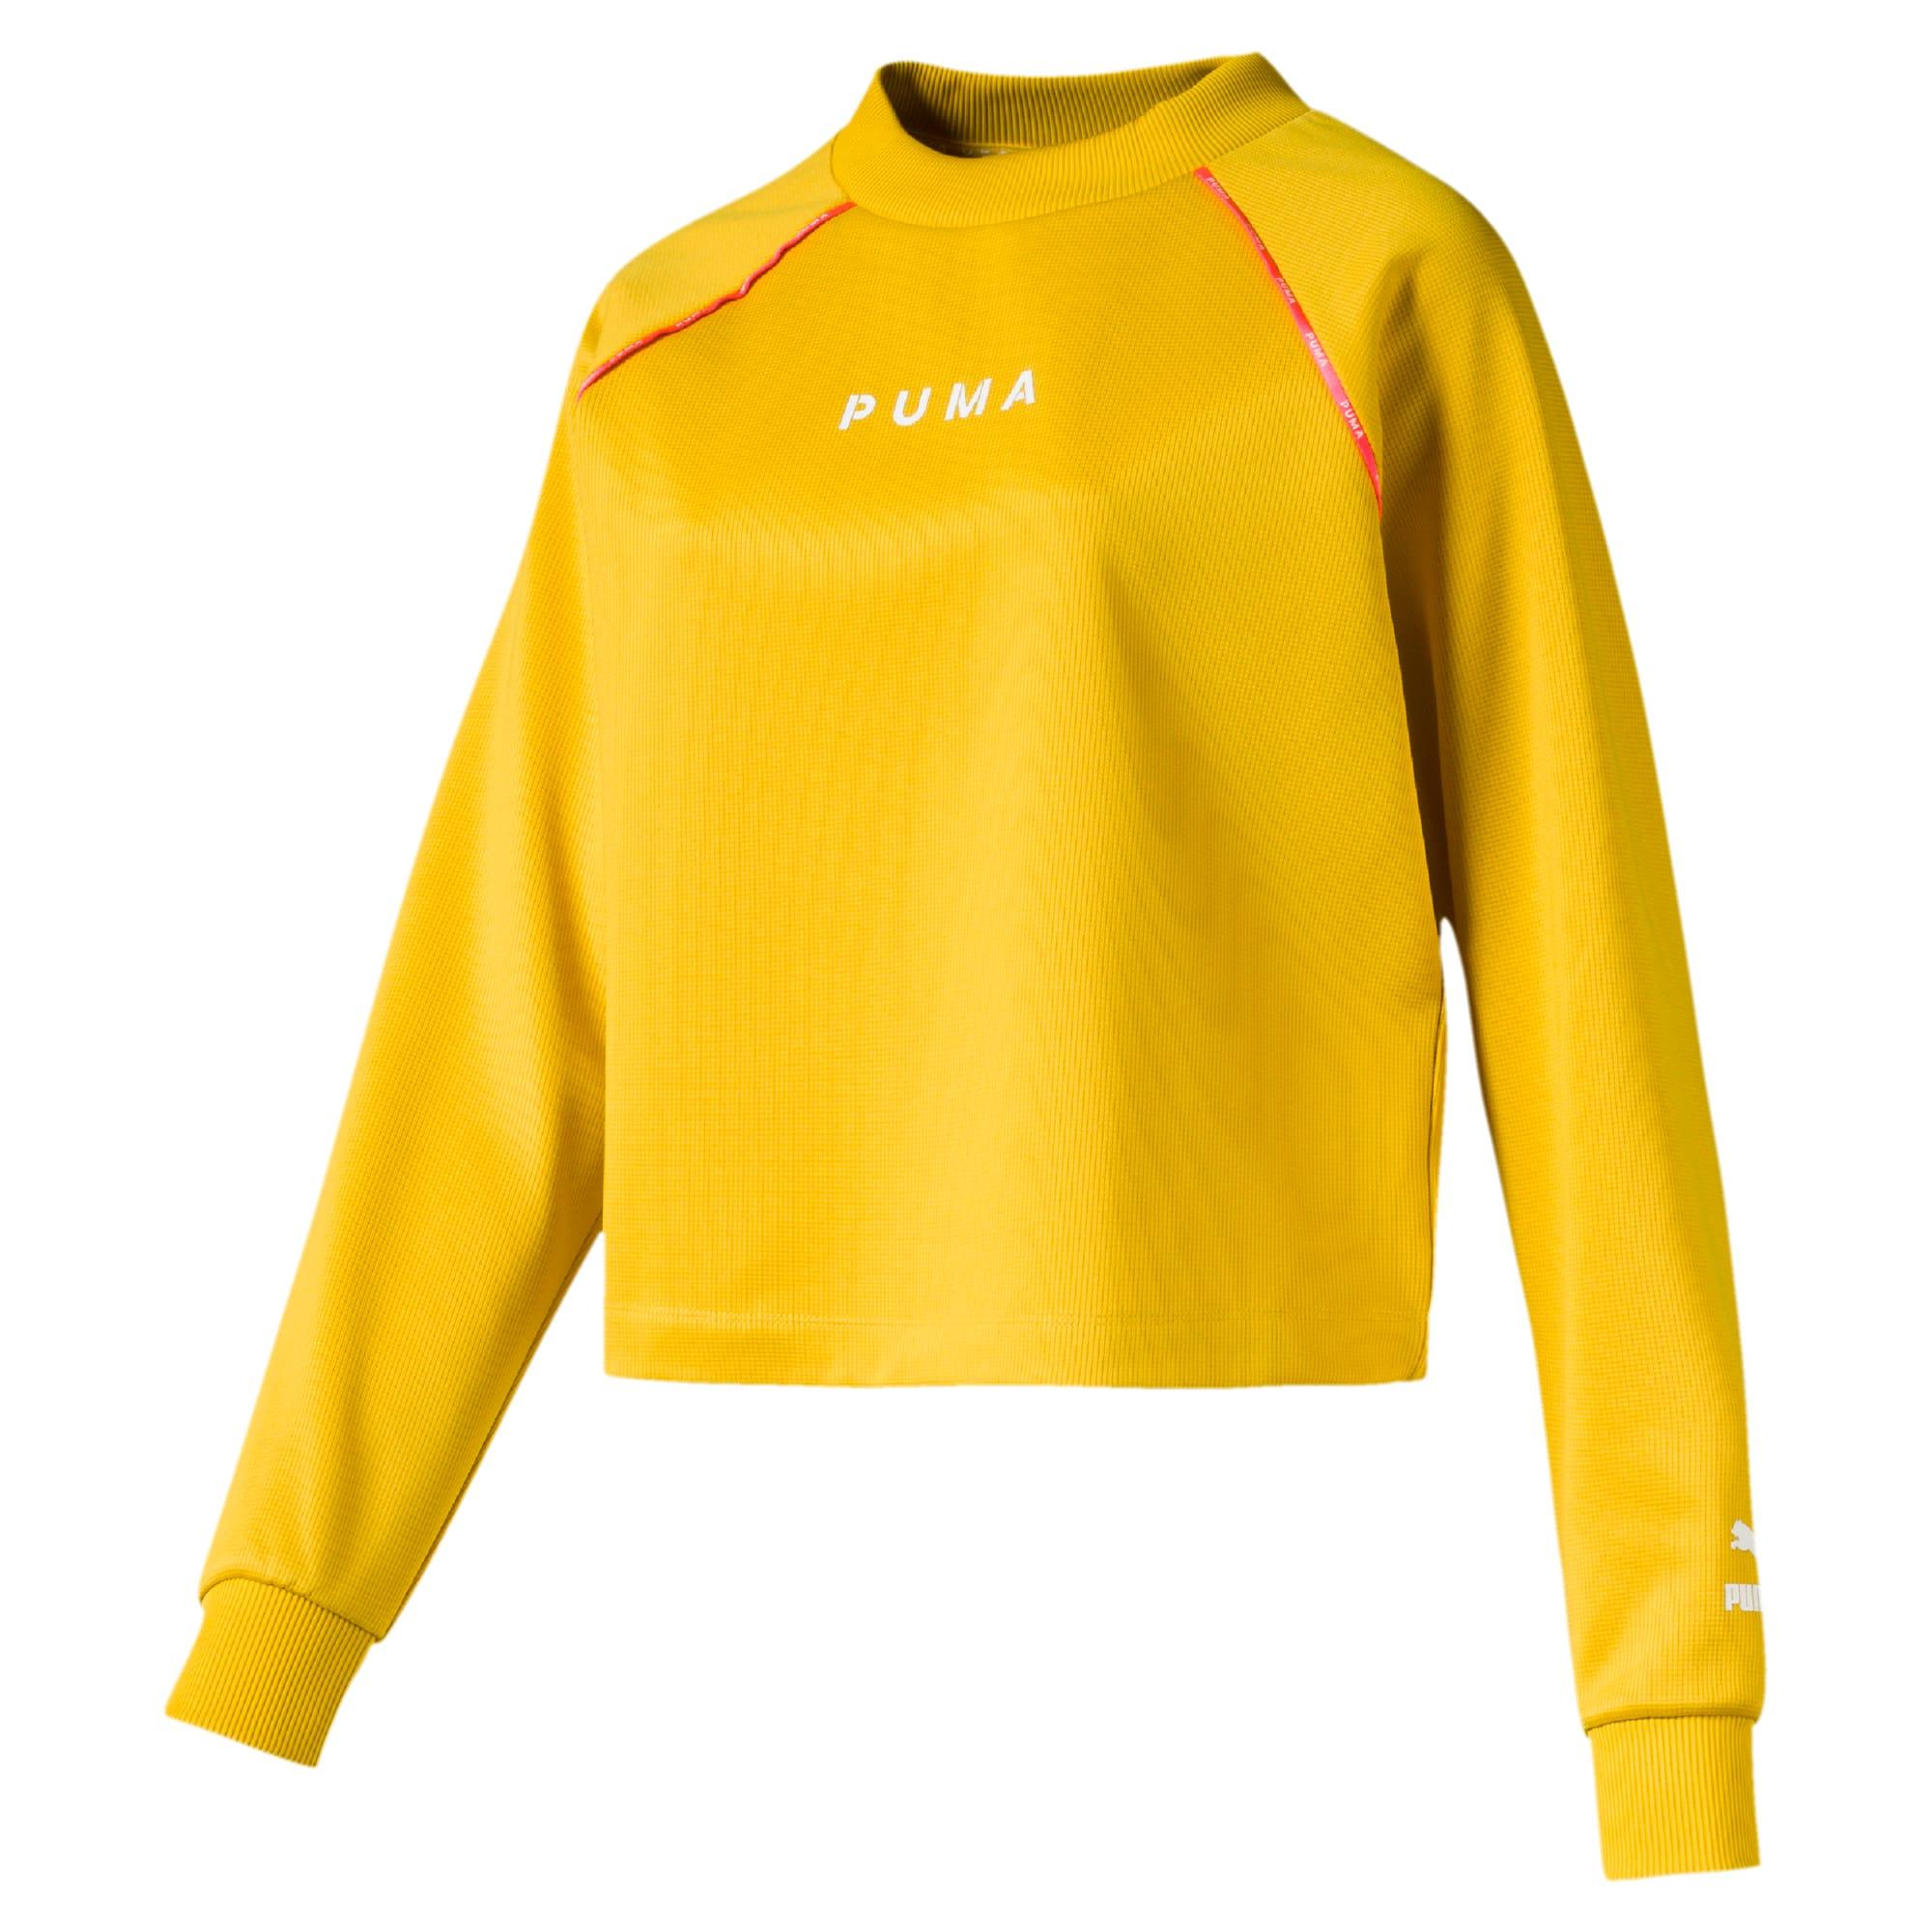 Thumbnail 1 of PUMA XTG Women's Crewneck Sweatshirt, Sulphur, medium